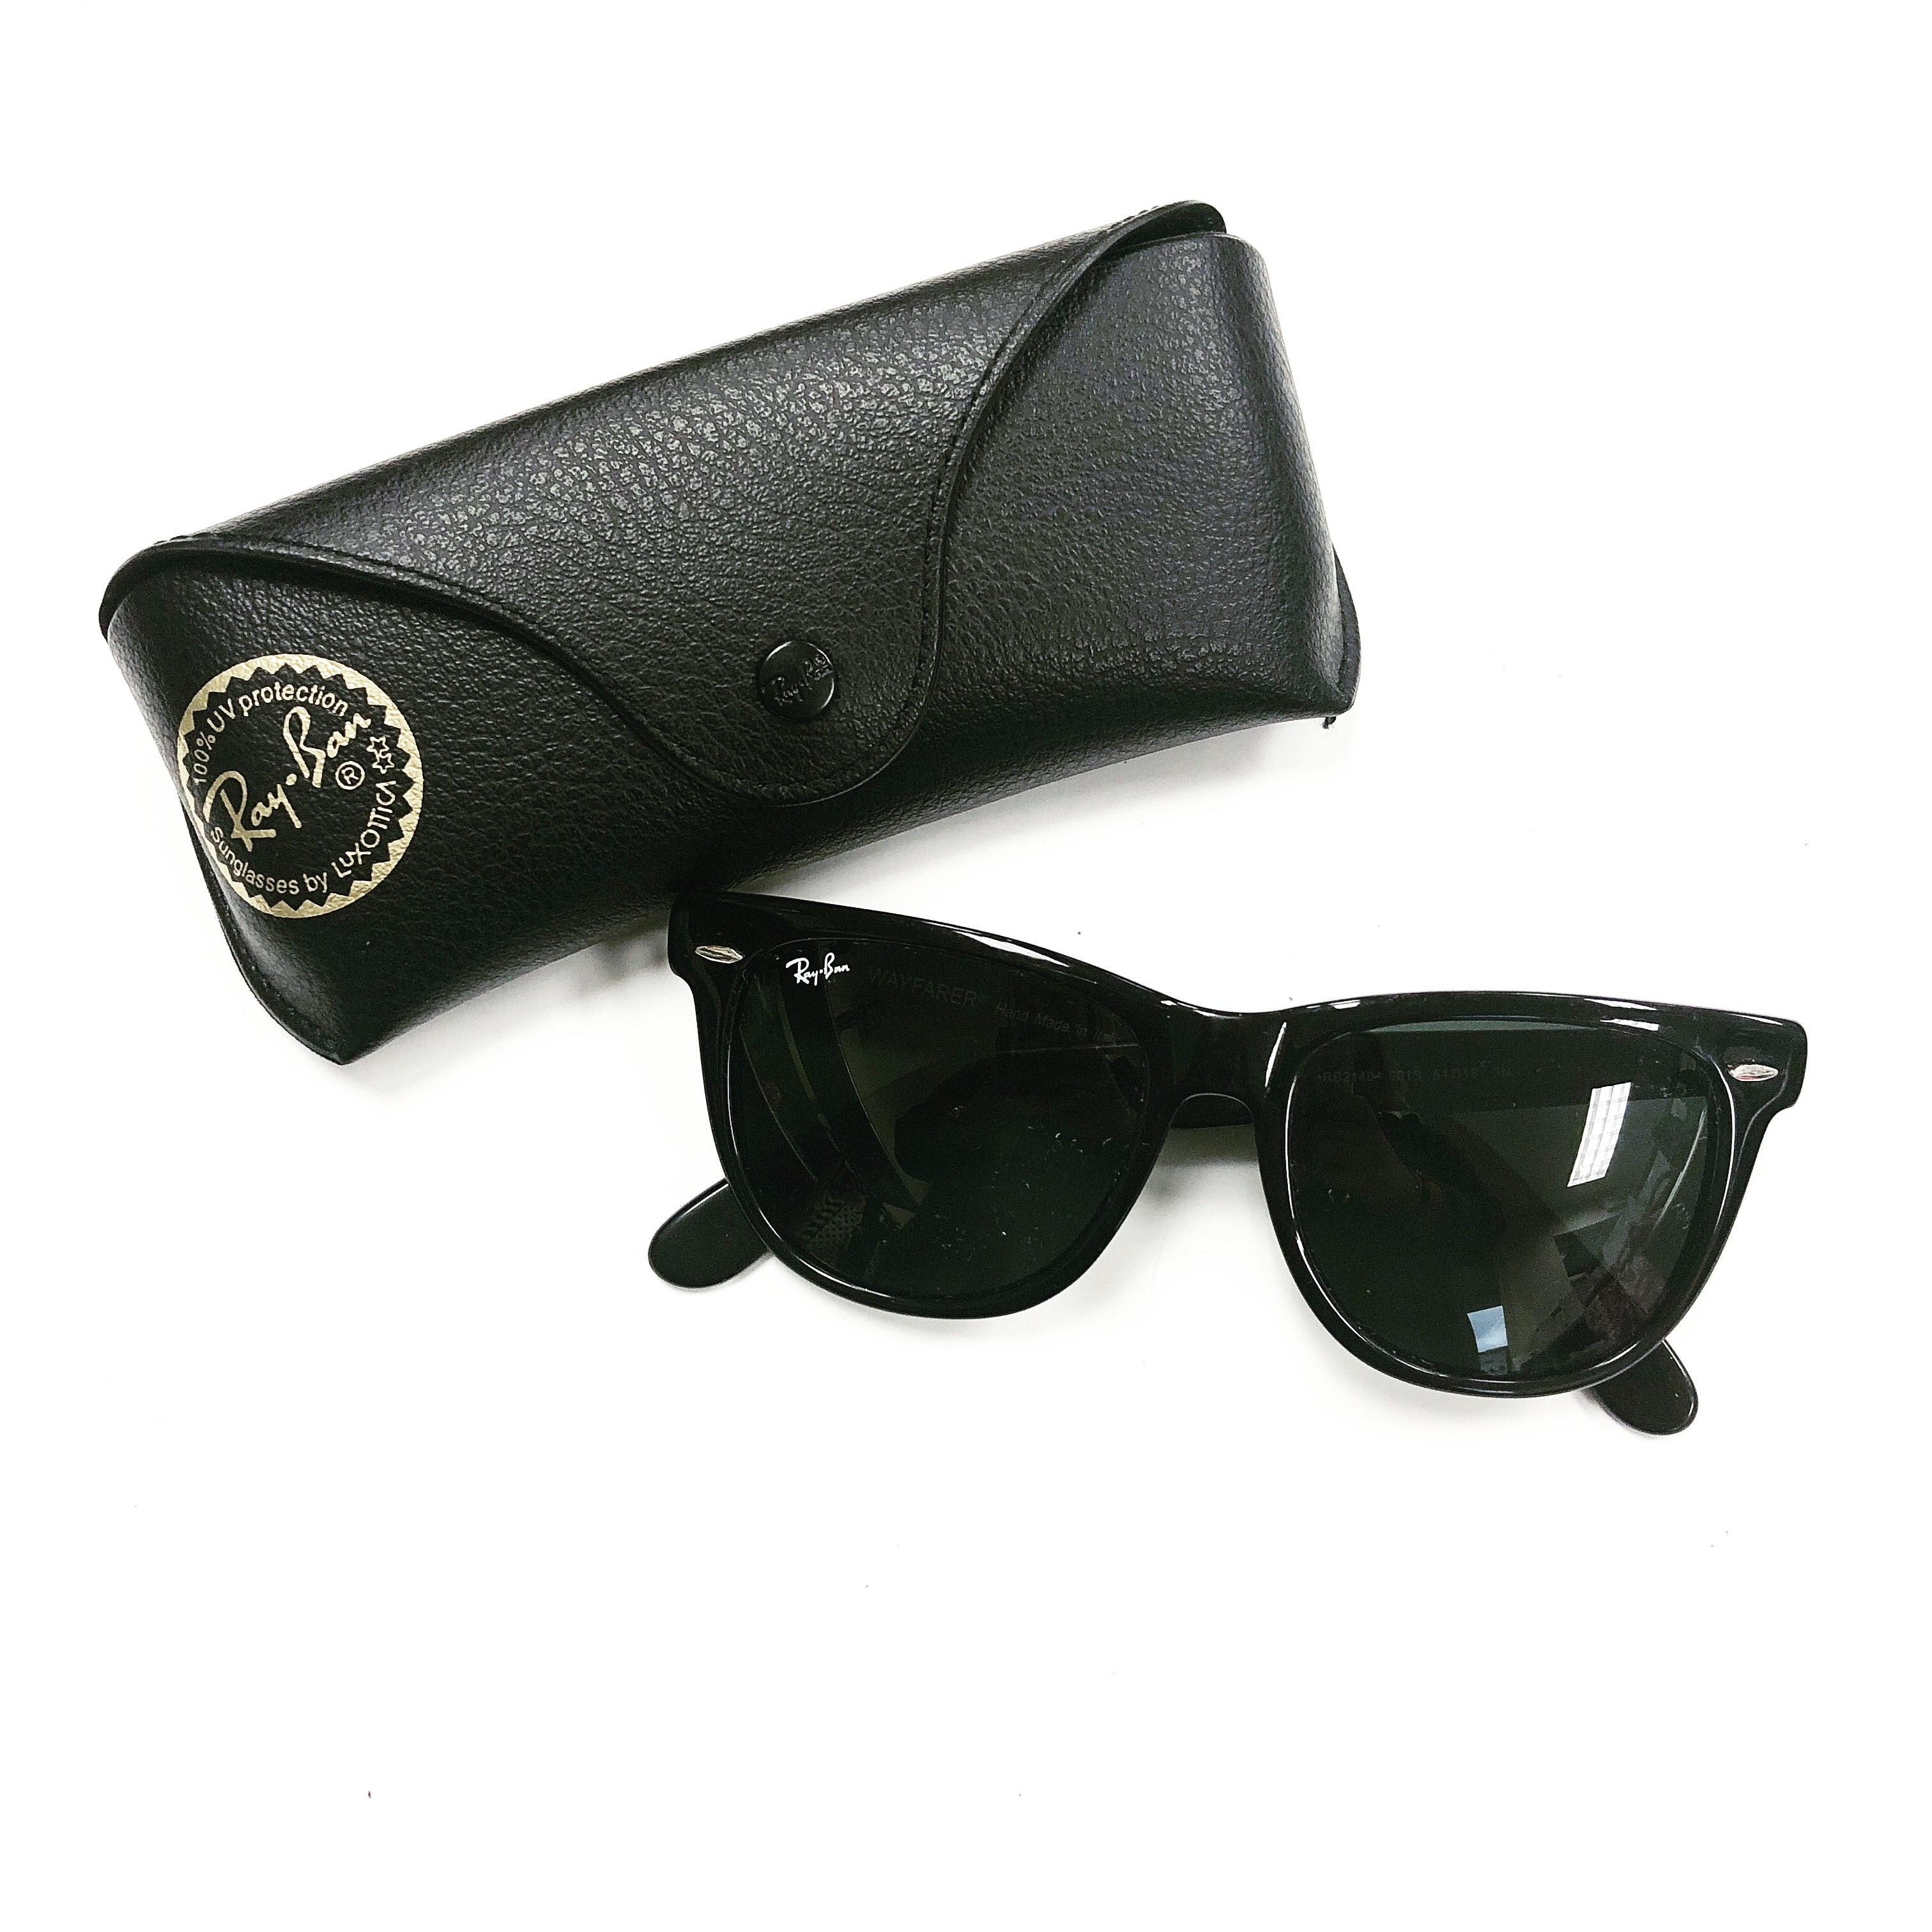 Sunglasses_164631A.jpg